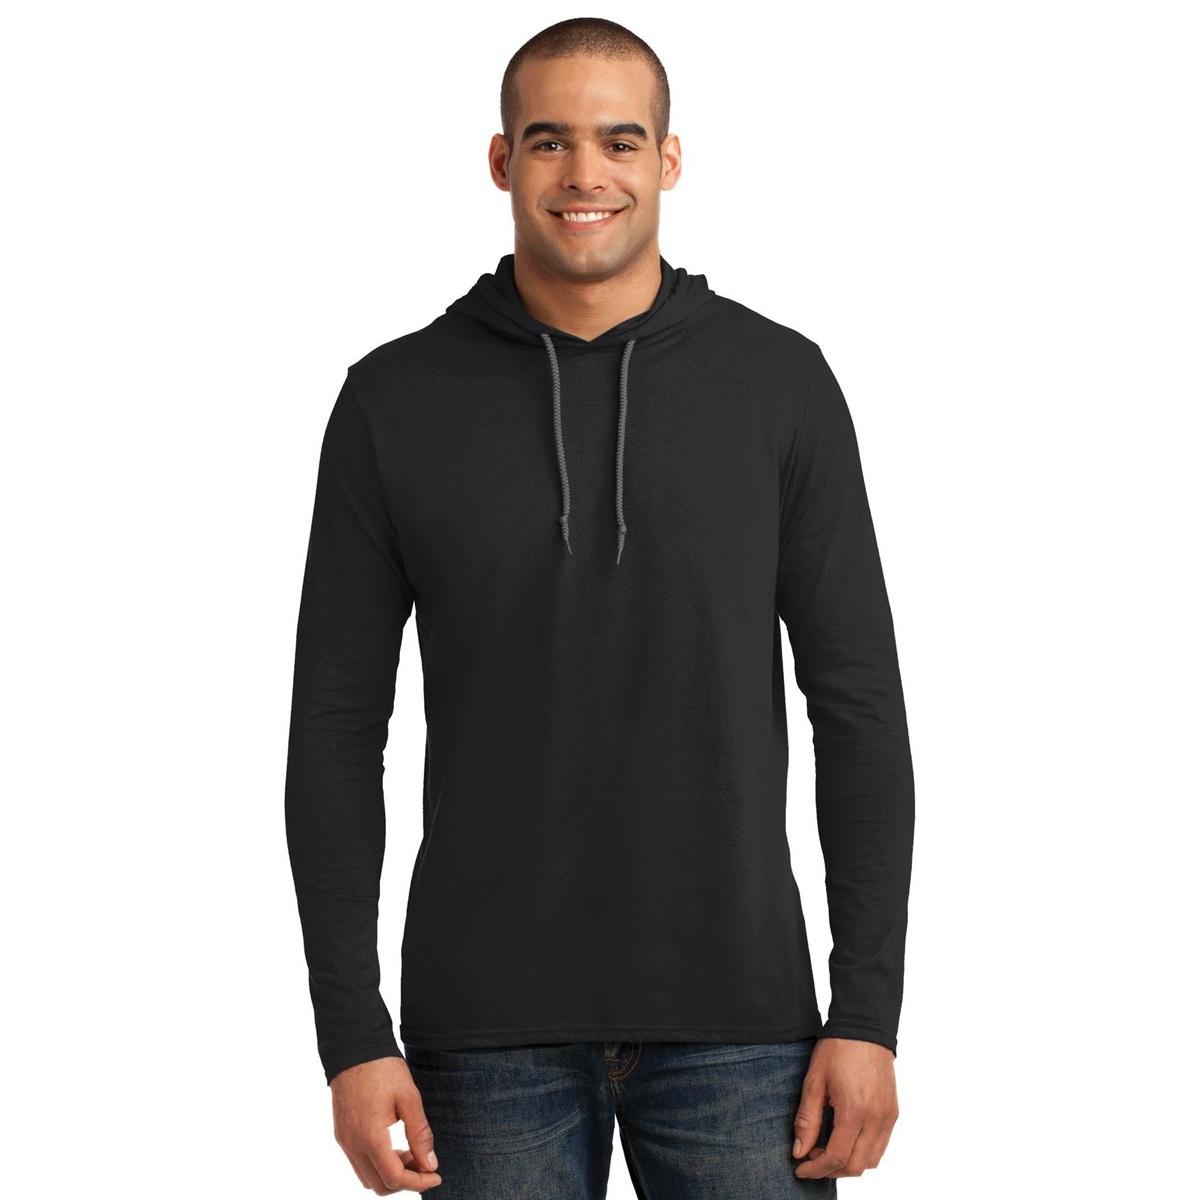 Anvil 987 100 ring spun cotton long sleeve hooded t shirt for 100 ringspun cotton t shirt wholesale